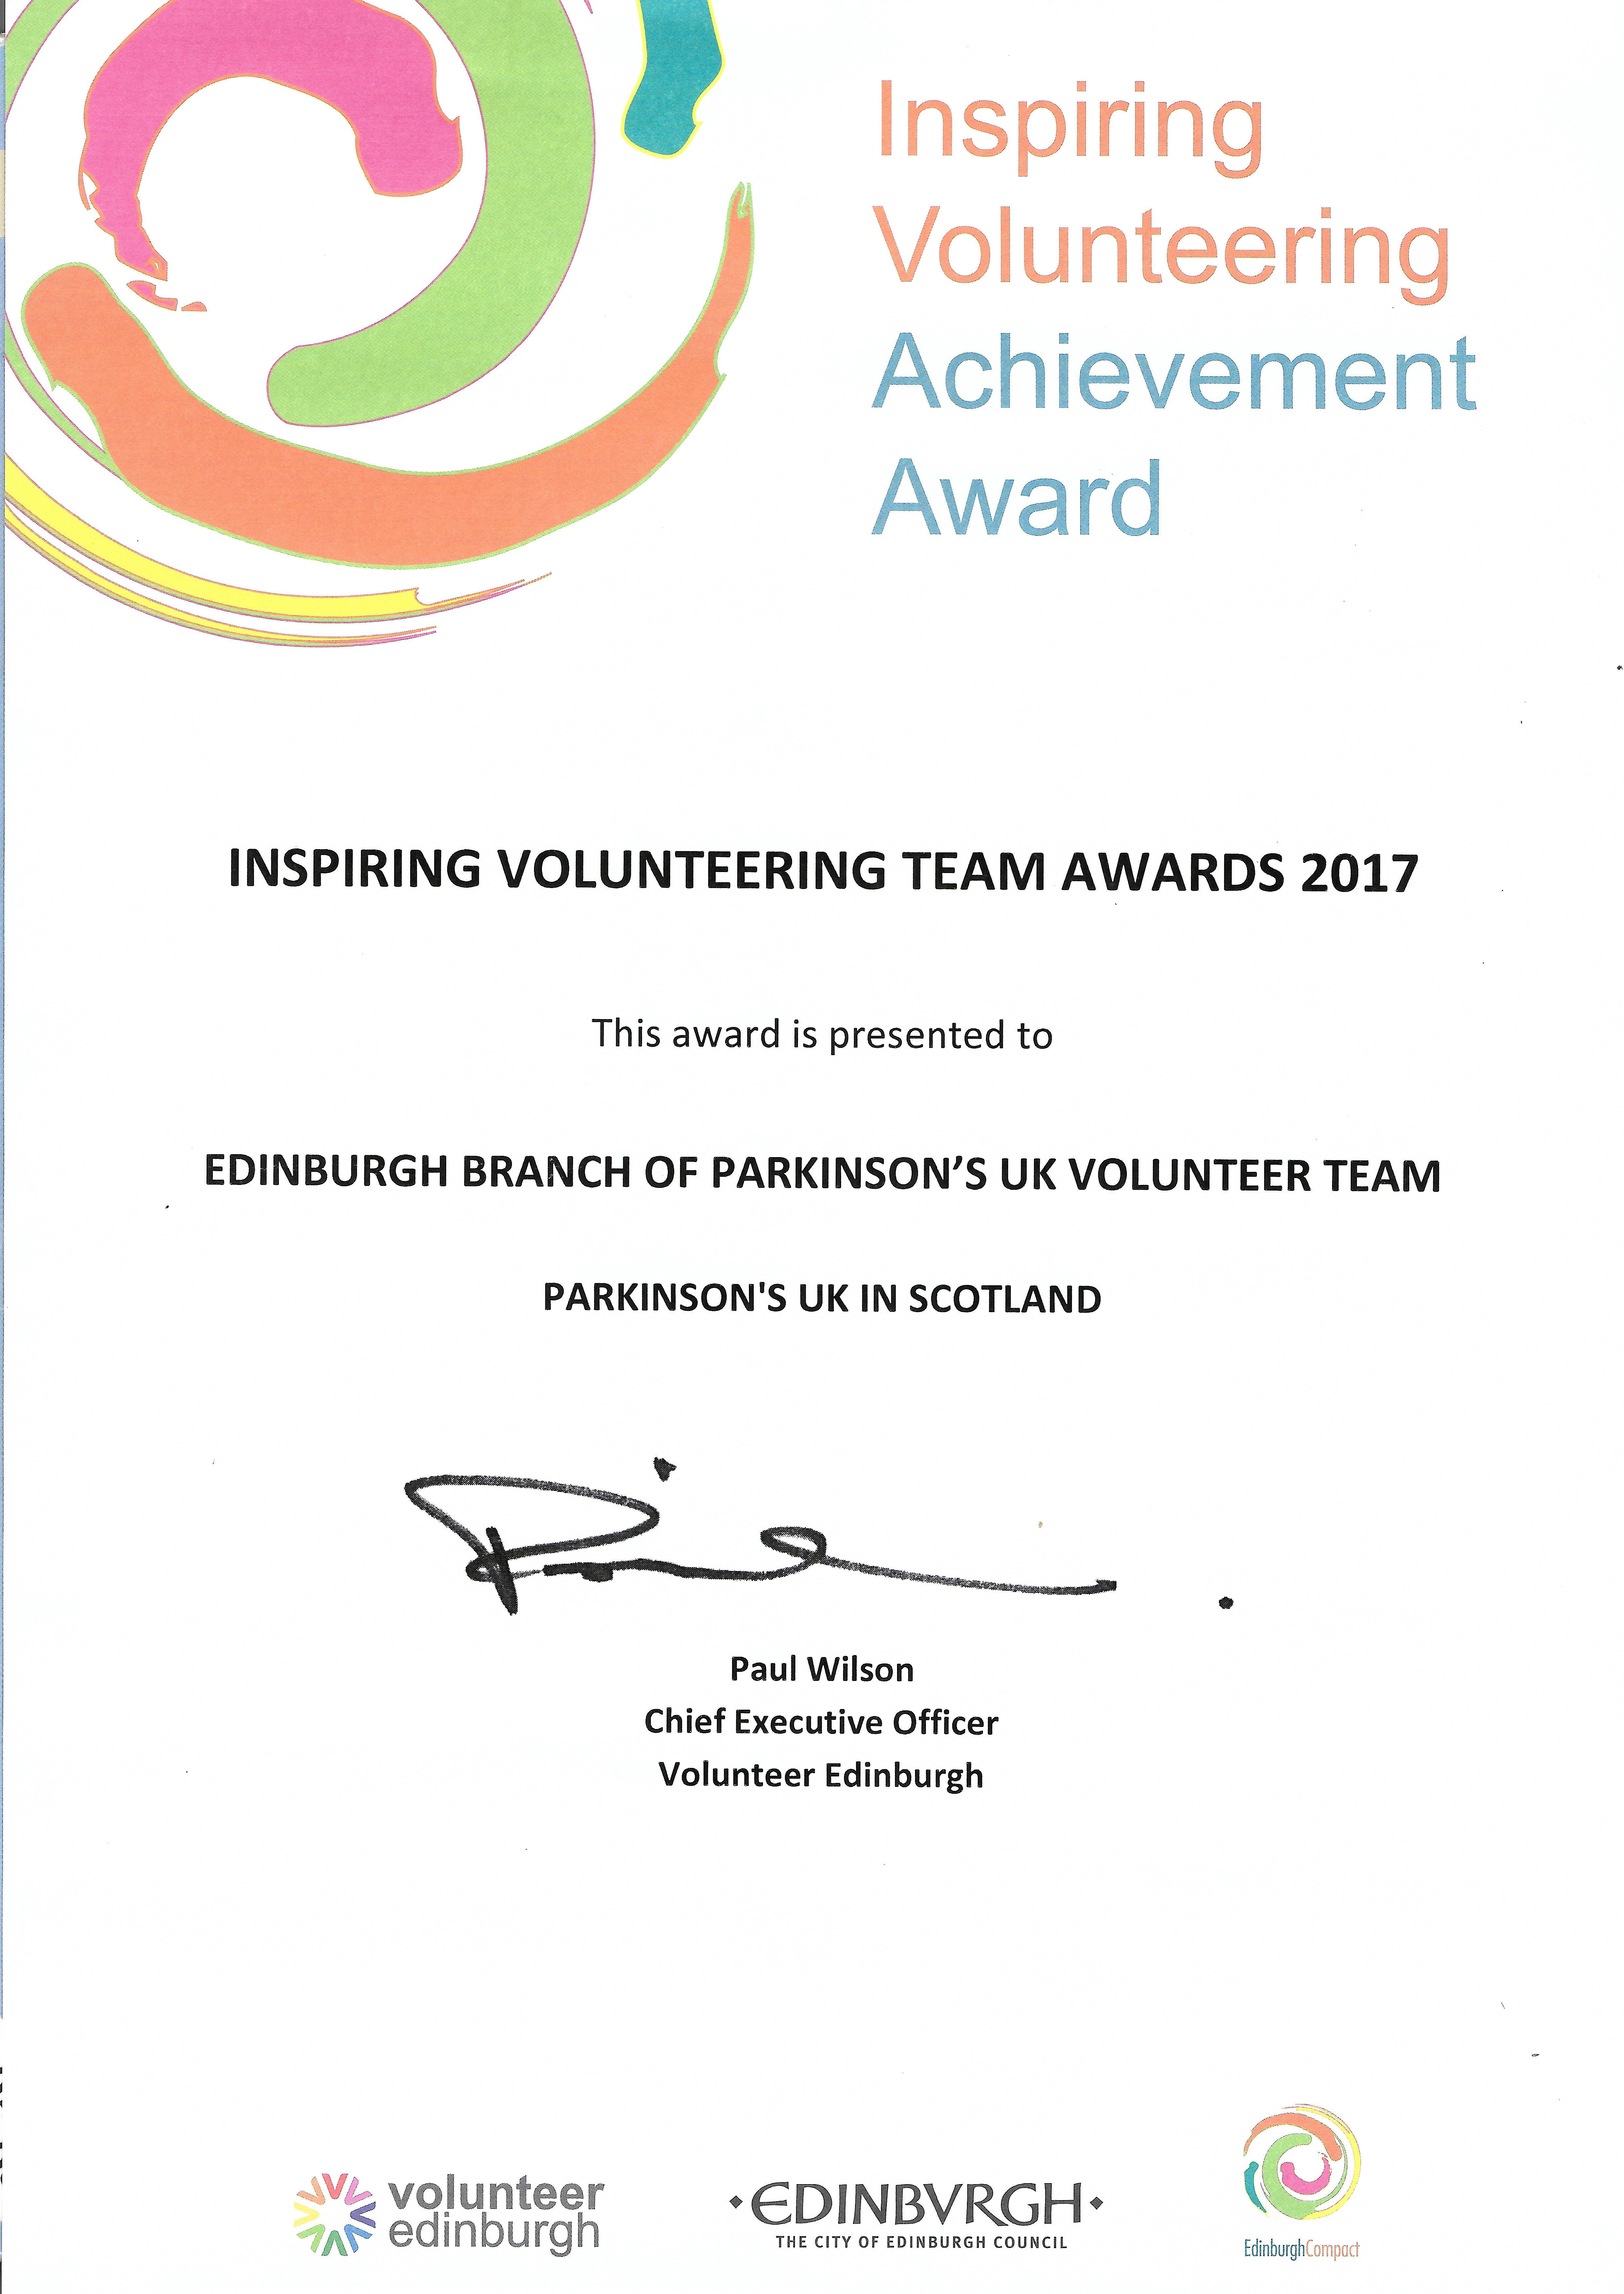 Volunteering award